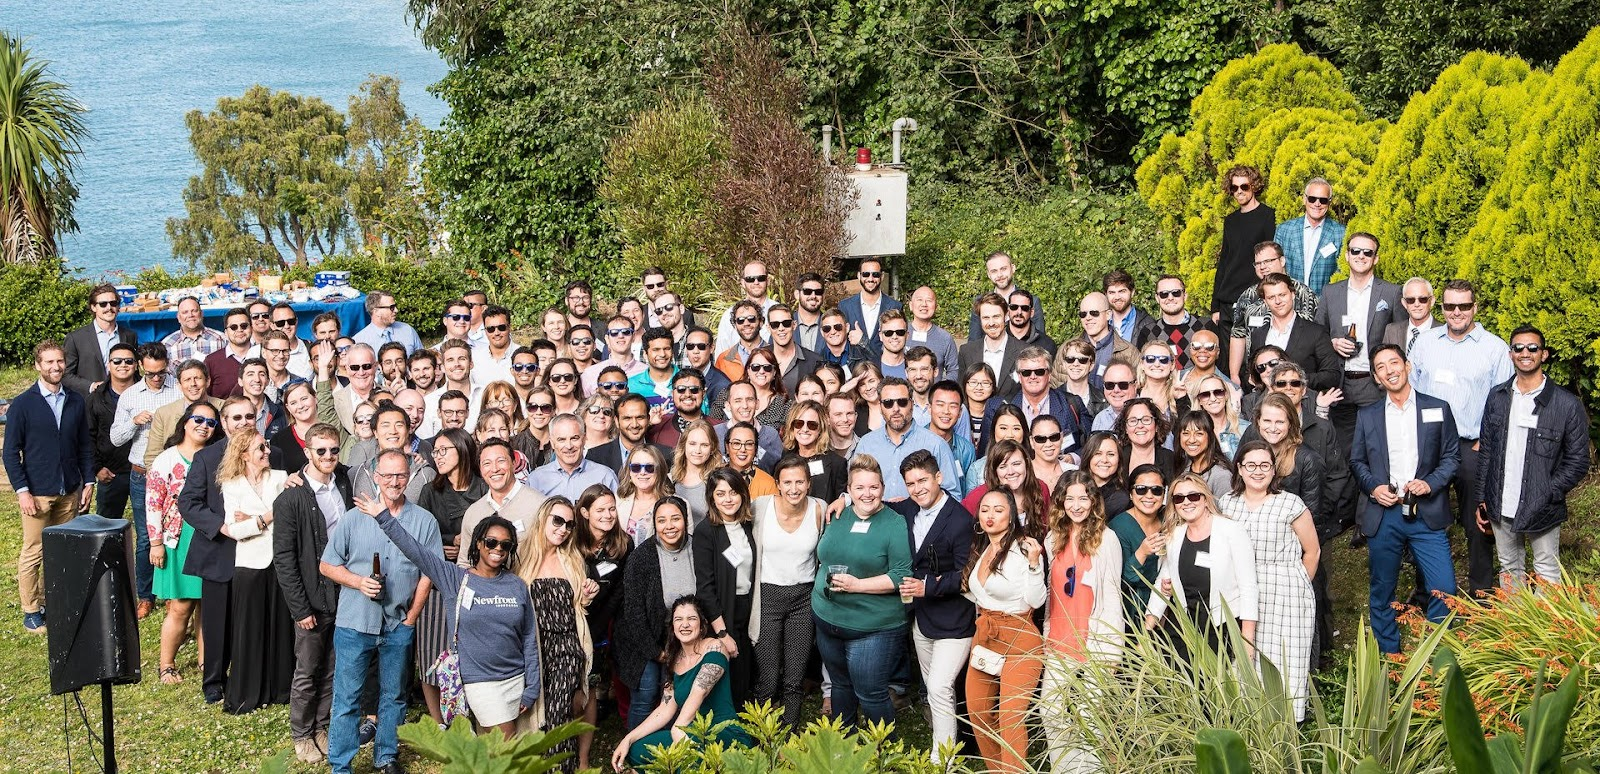 Group photo of Newfront Insurance employees